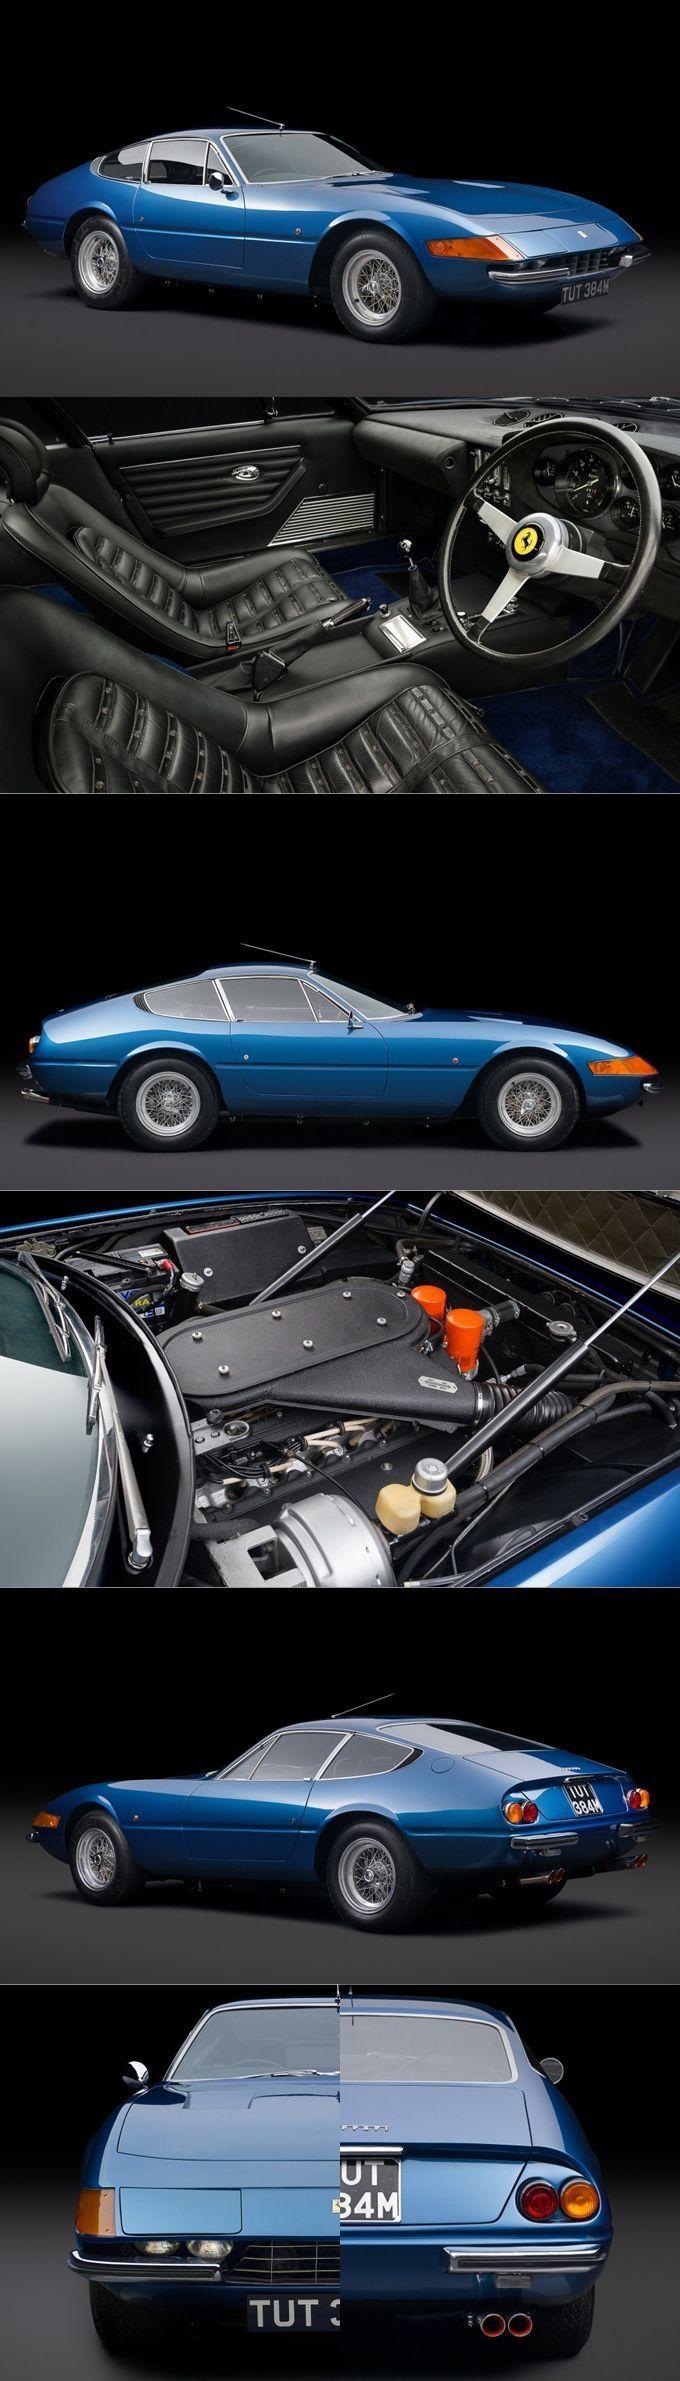 Awesome Ferrari 2017: 1973 Ferrari 365 GTB/4 Daytona / 352hp V12 / Italy / blue... Check more at http://24cars.top/2017/ferrari-2017-1973-ferrari-365-gtb4-daytona-352hp-v12-italy-blue/